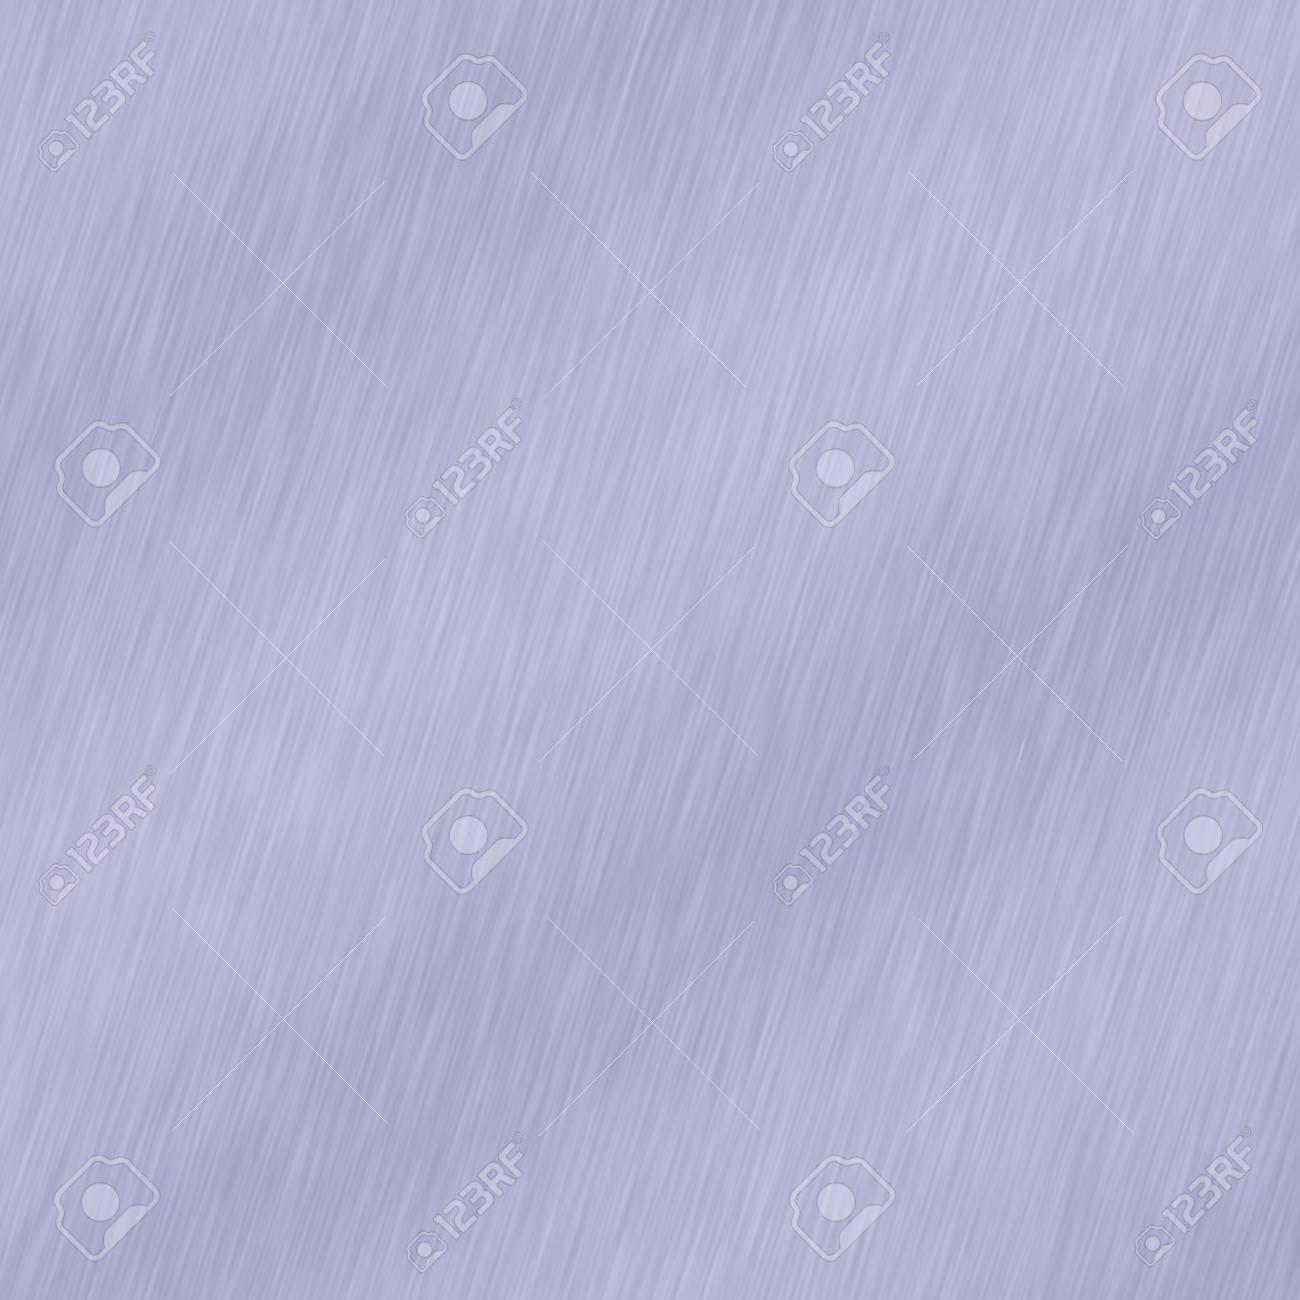 Brushed metal surface texture seamless background illustration Stock Illustration - 3529770